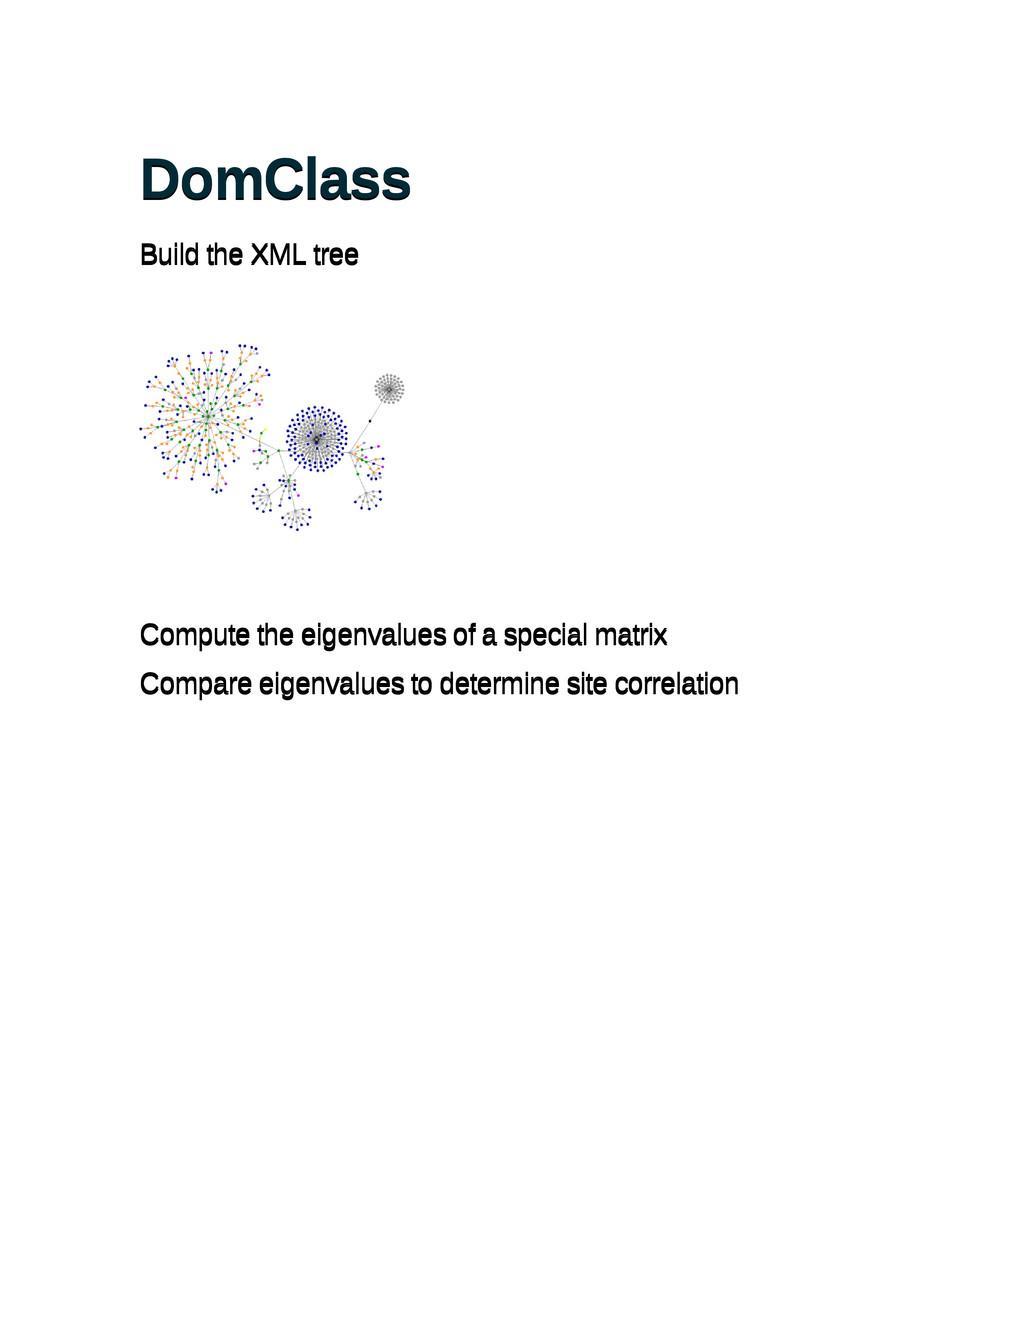 DomClass DomClass Build the XML tree Build the ...